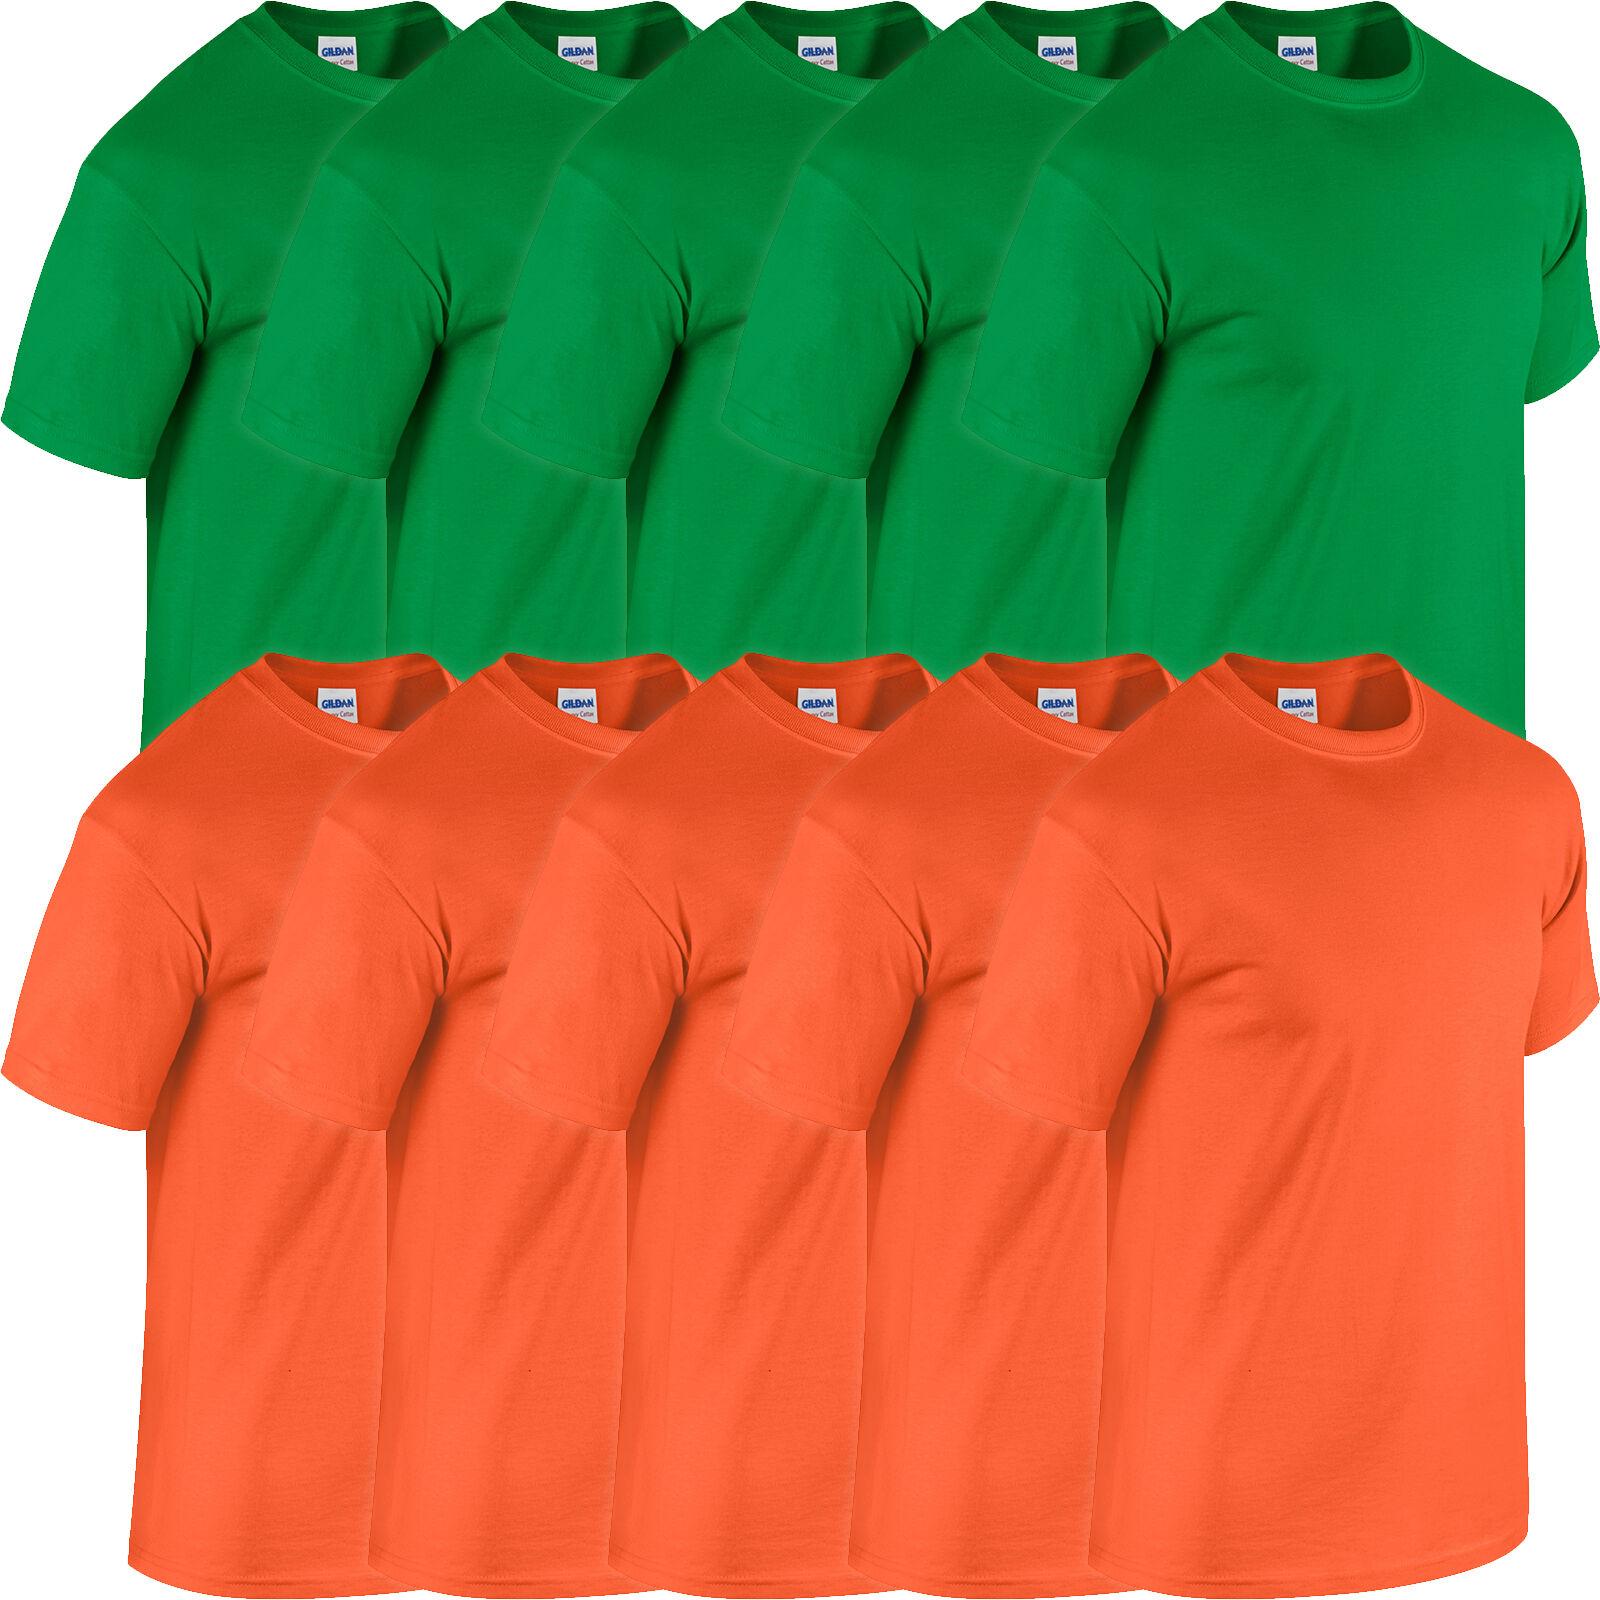 5 x Kelly Green and Orange